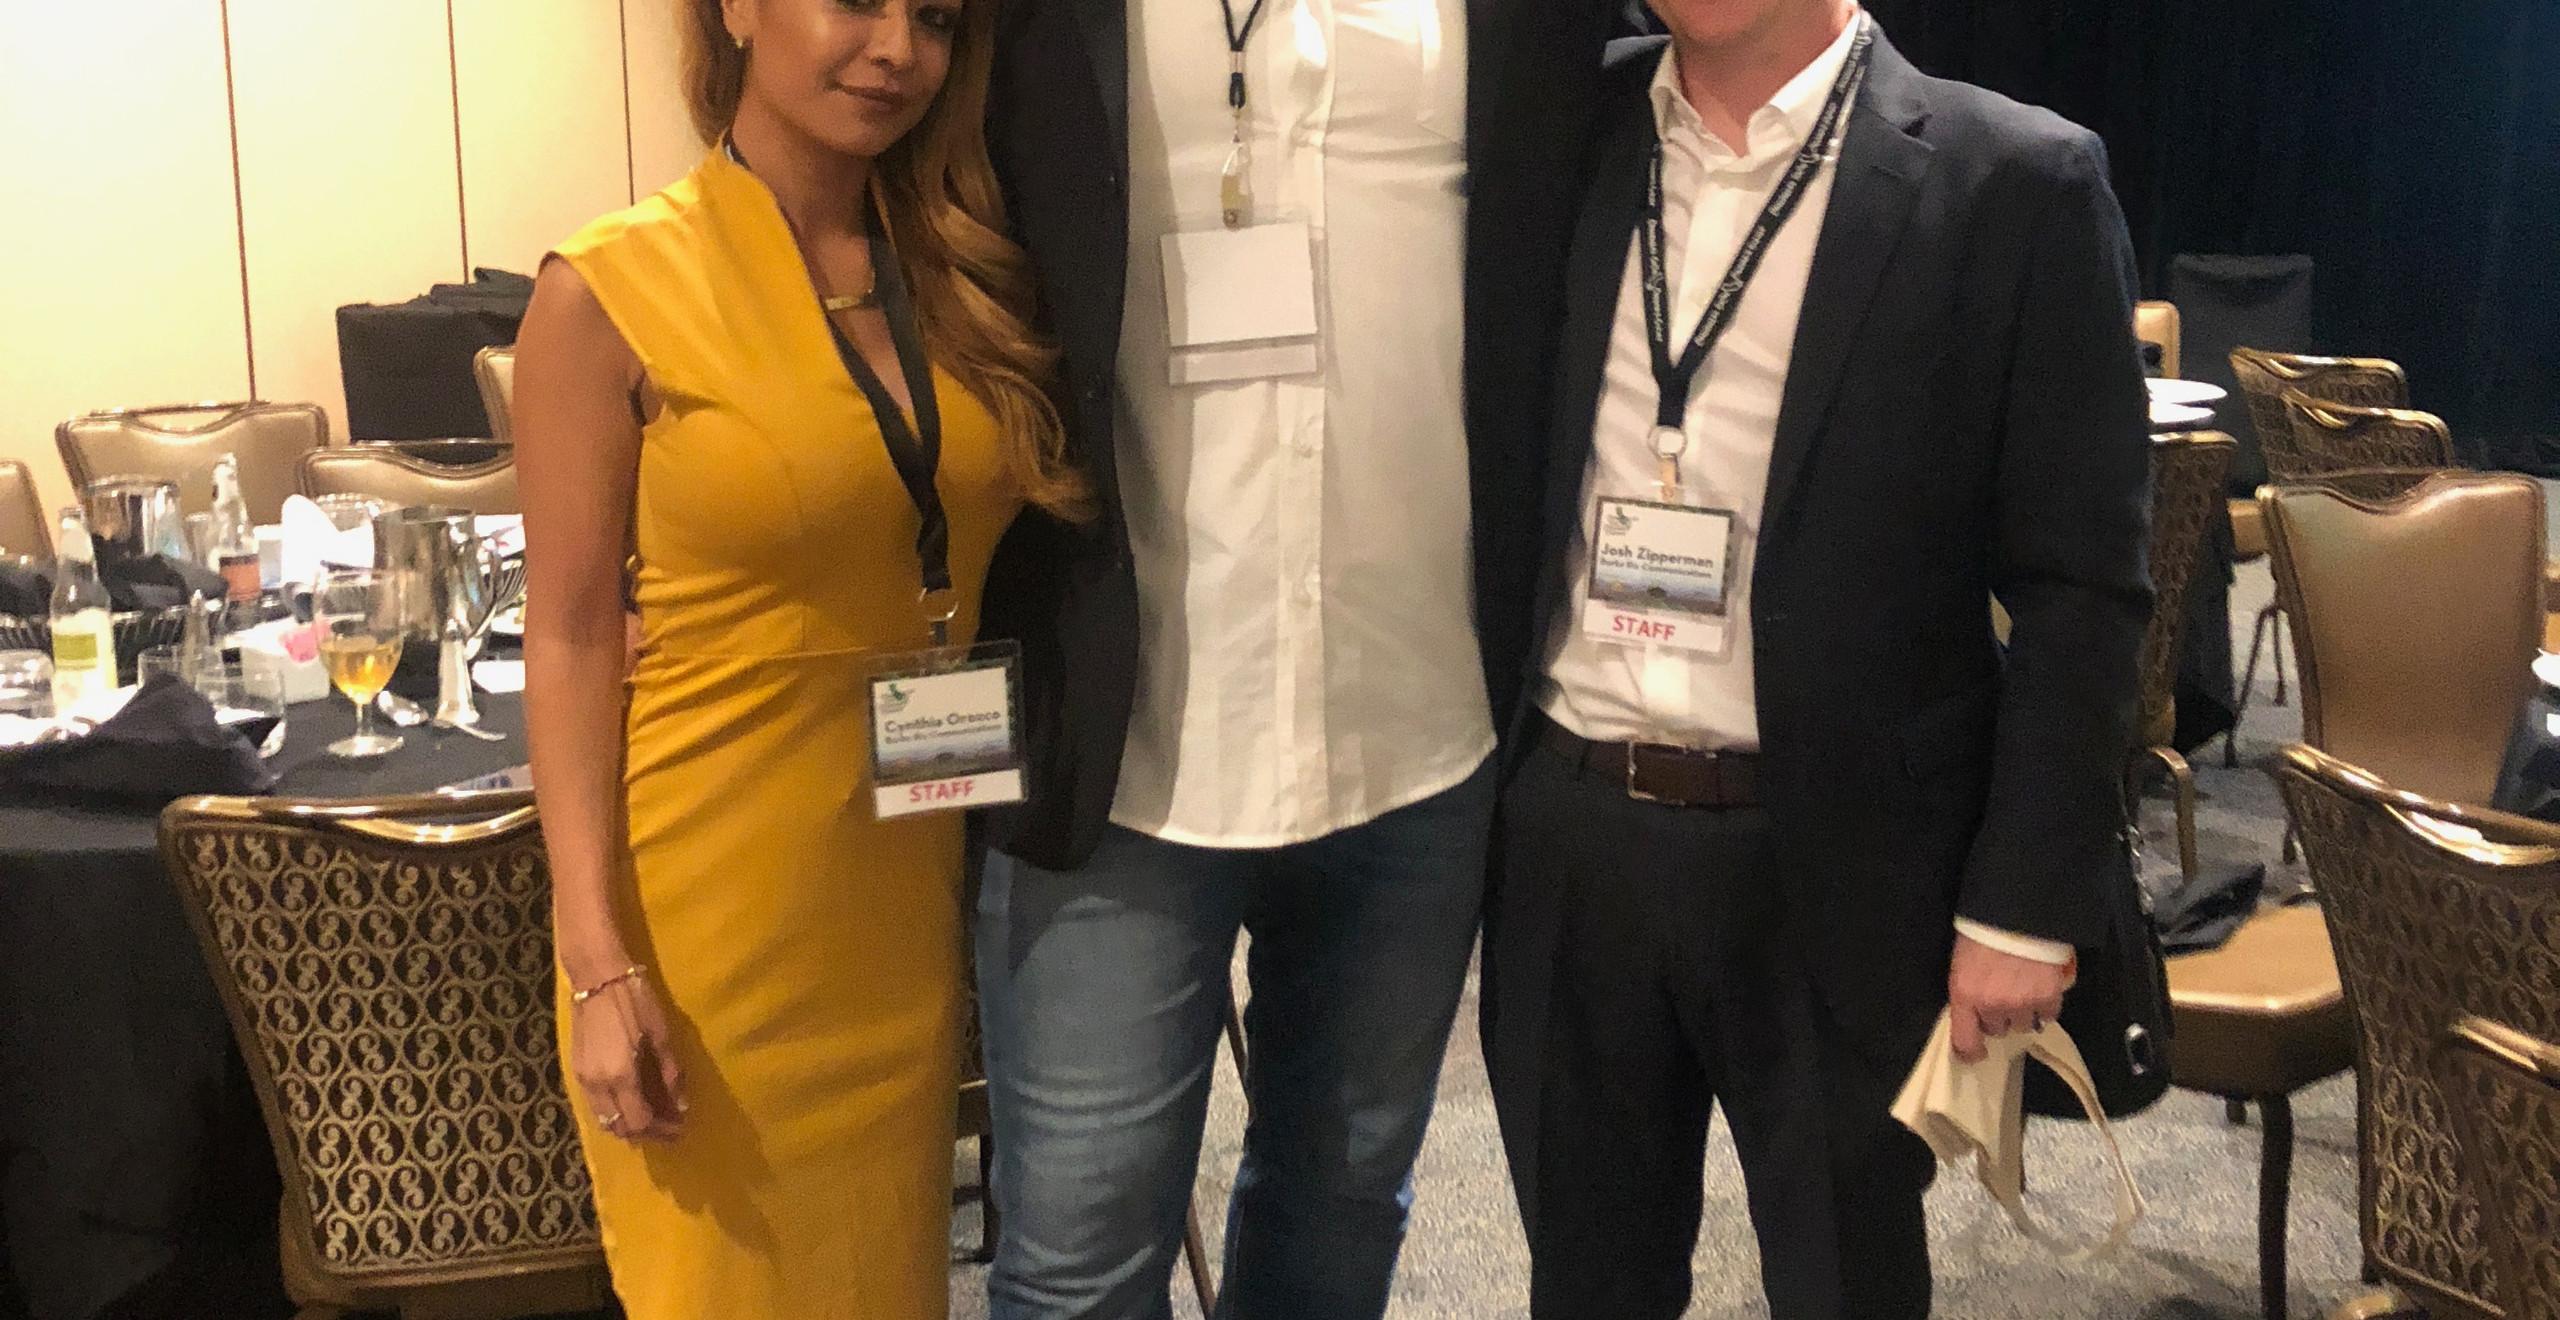 BRC's Cynthia Orozco & Josh Zipperman with NFL All-Star Athlete Kyle Turley